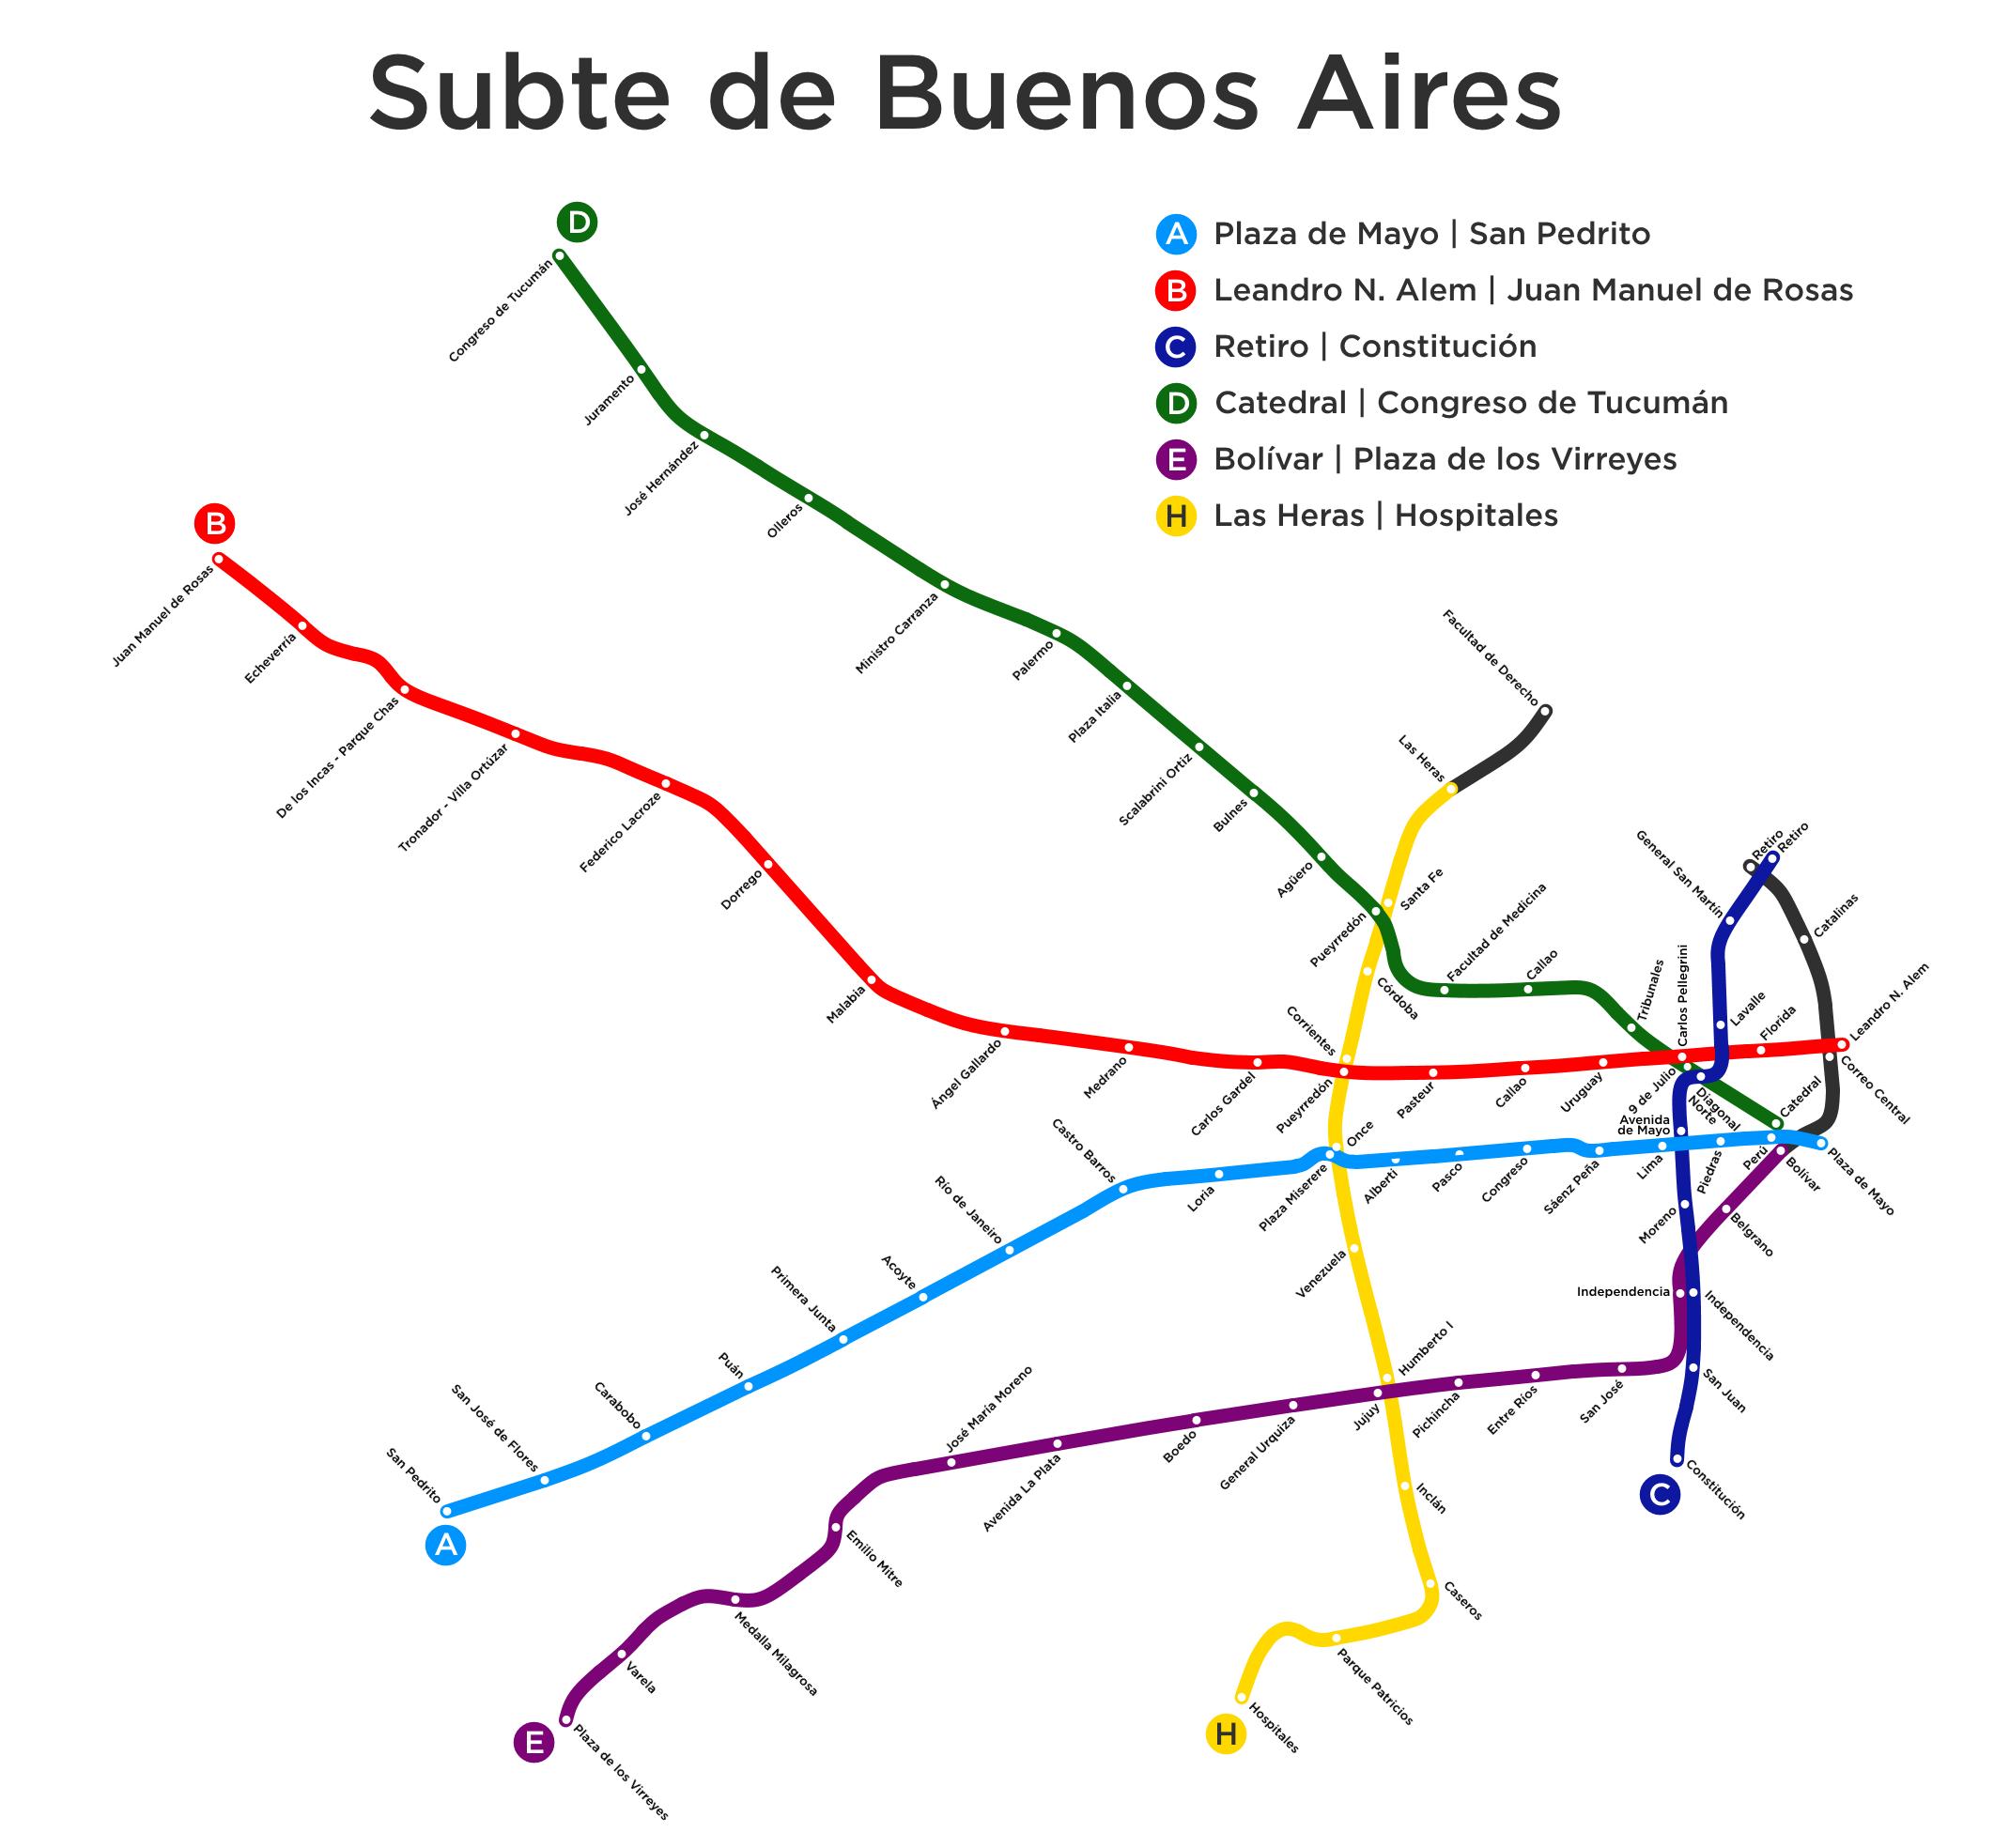 Buenos Aires Underground Buenos Aires subway